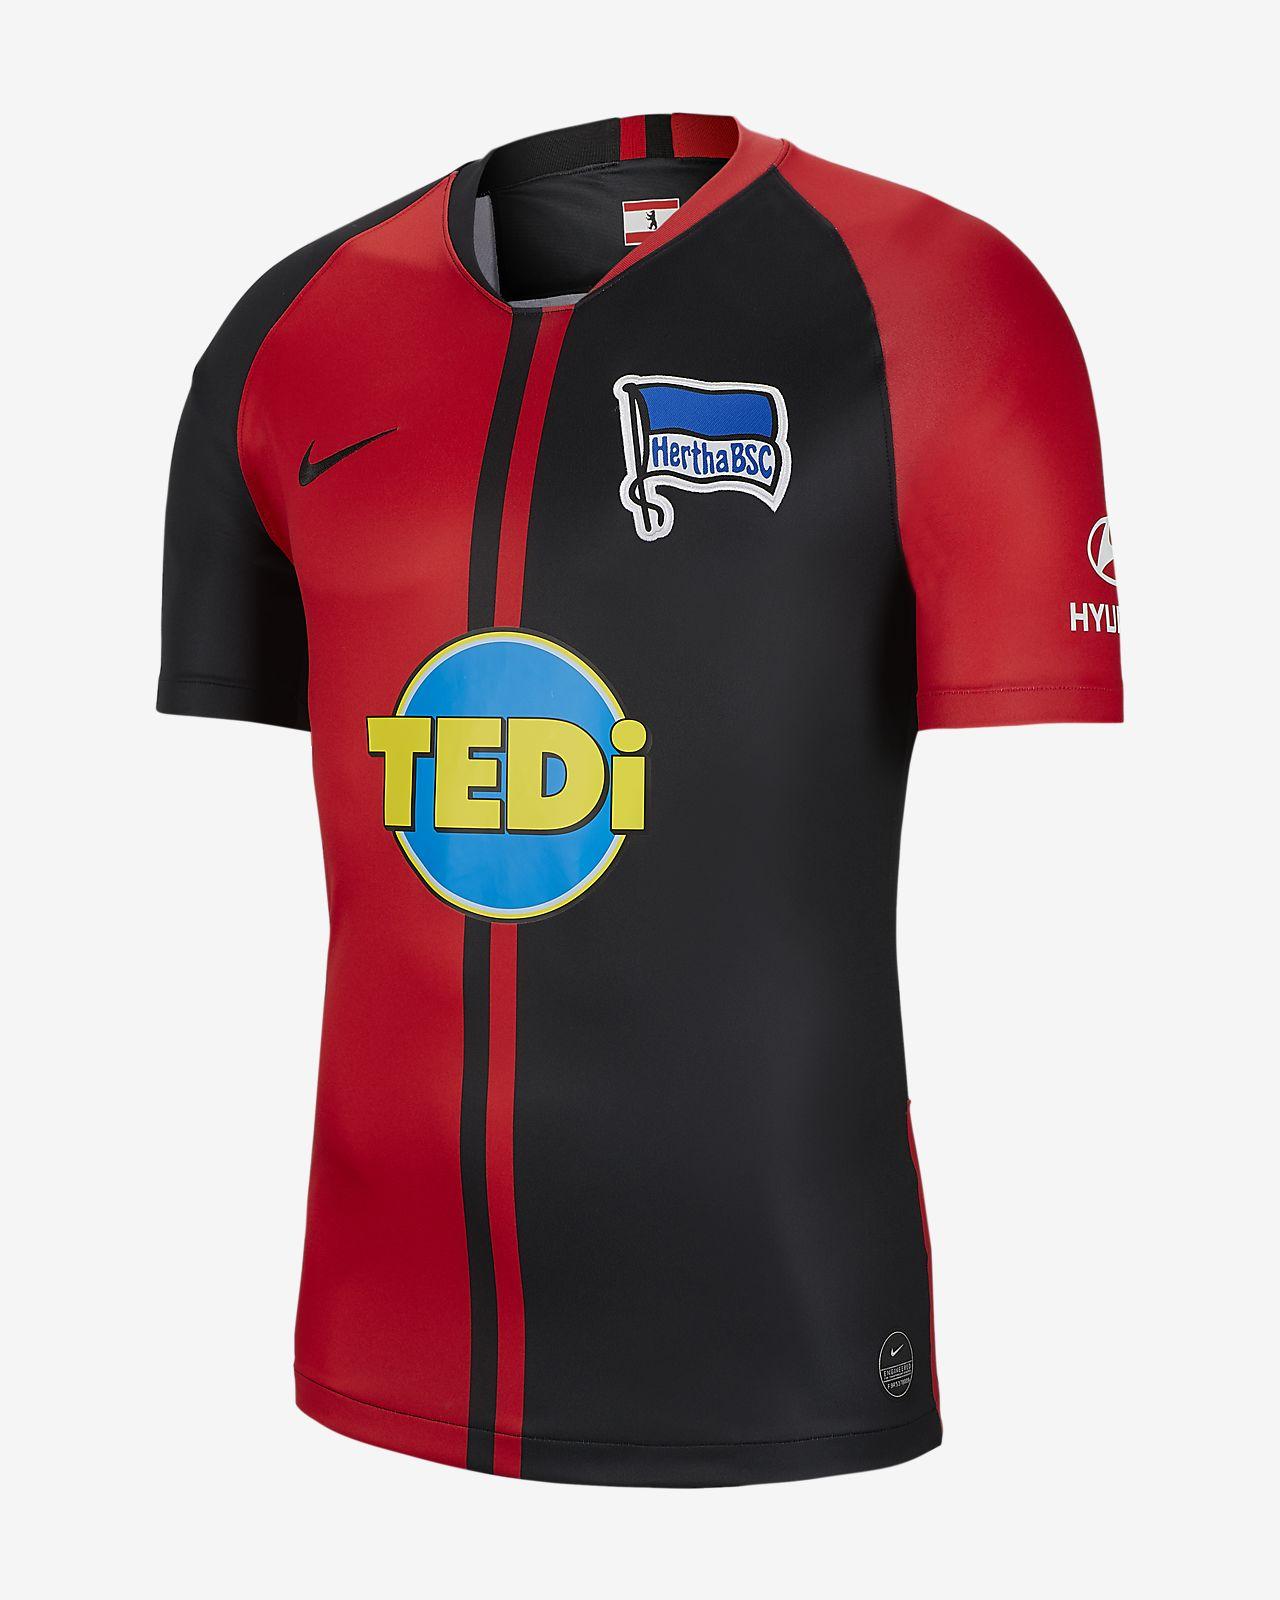 Hertha BSC 2019/20 Stadium Away Camiseta de fútbol - Hombre